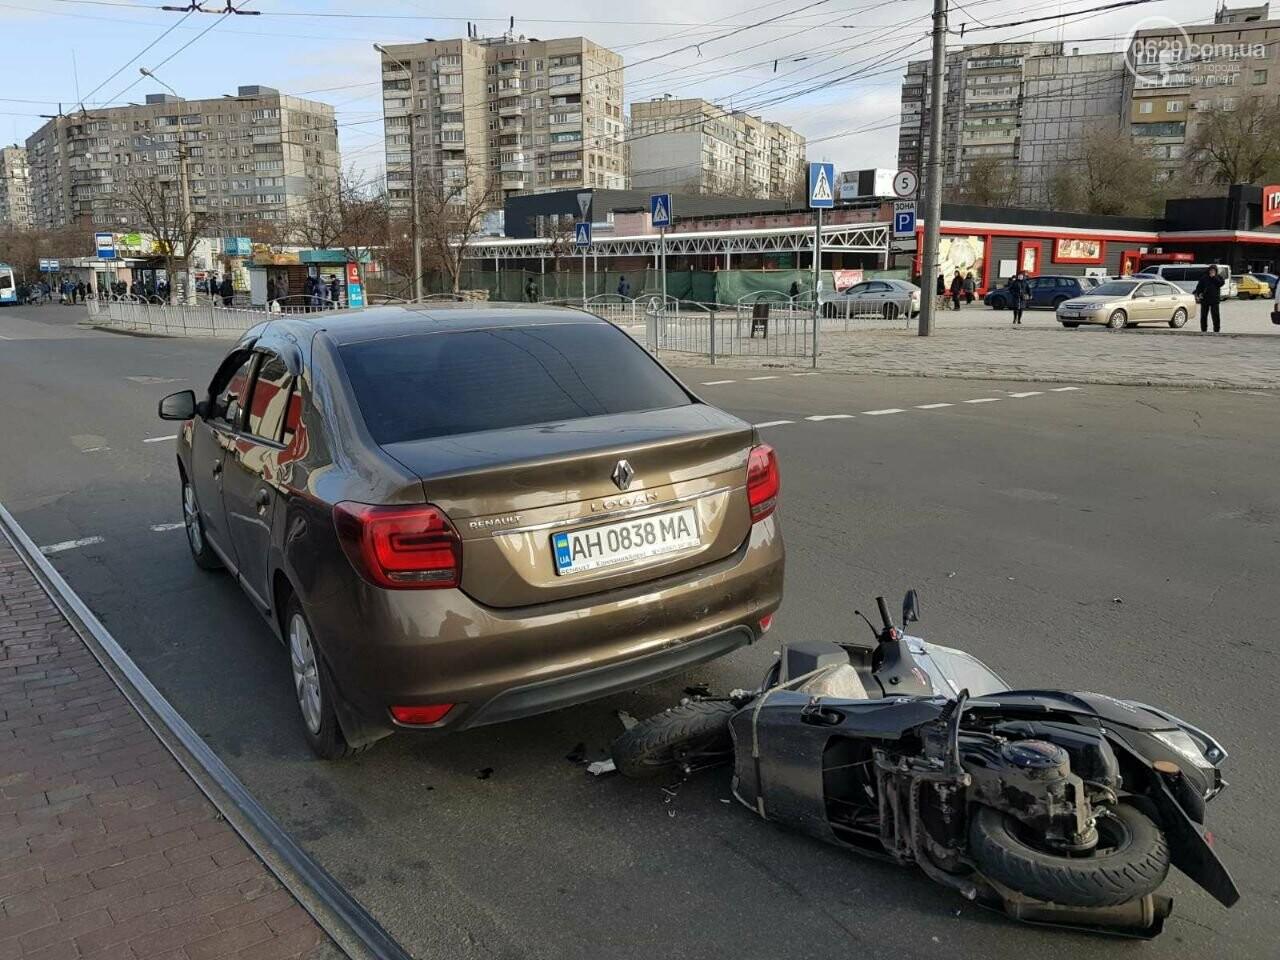 В Мариуполе скутерист врезался в легковушку, - ФОТО, фото-1